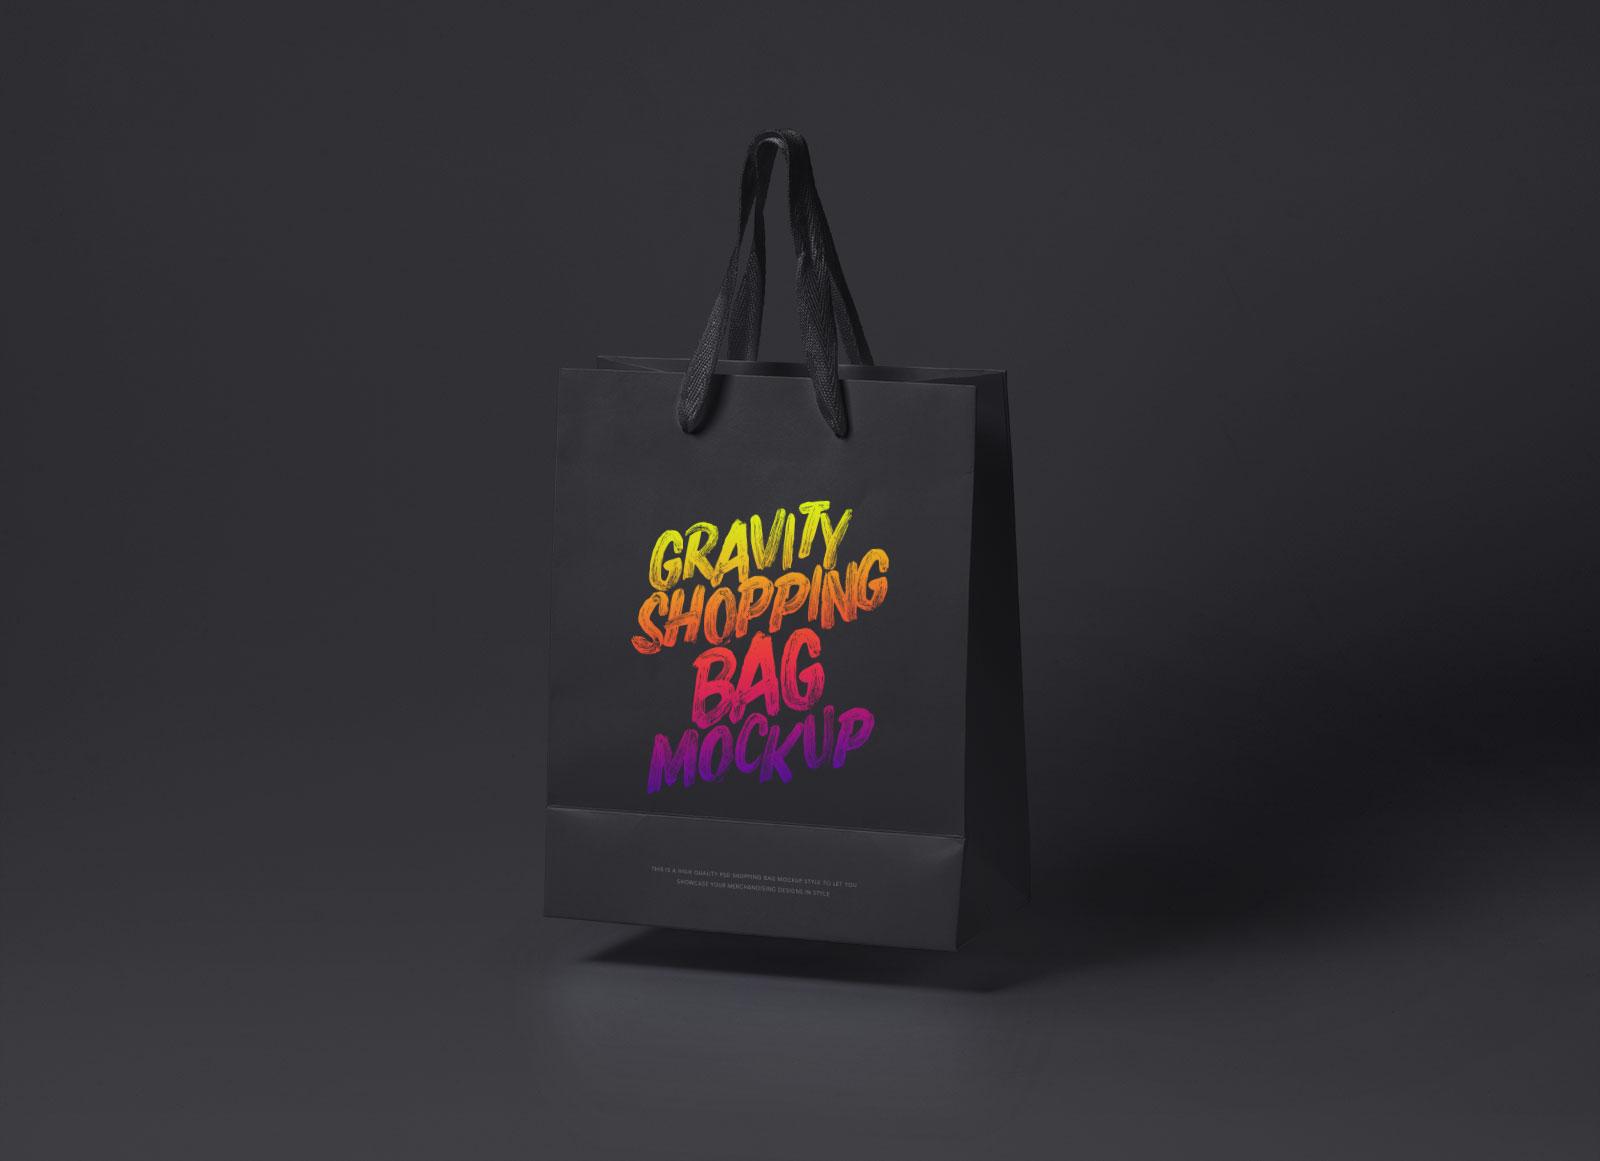 Free-Black-&-White-Floating-Shopping-Bag-Mockup-PSD-3